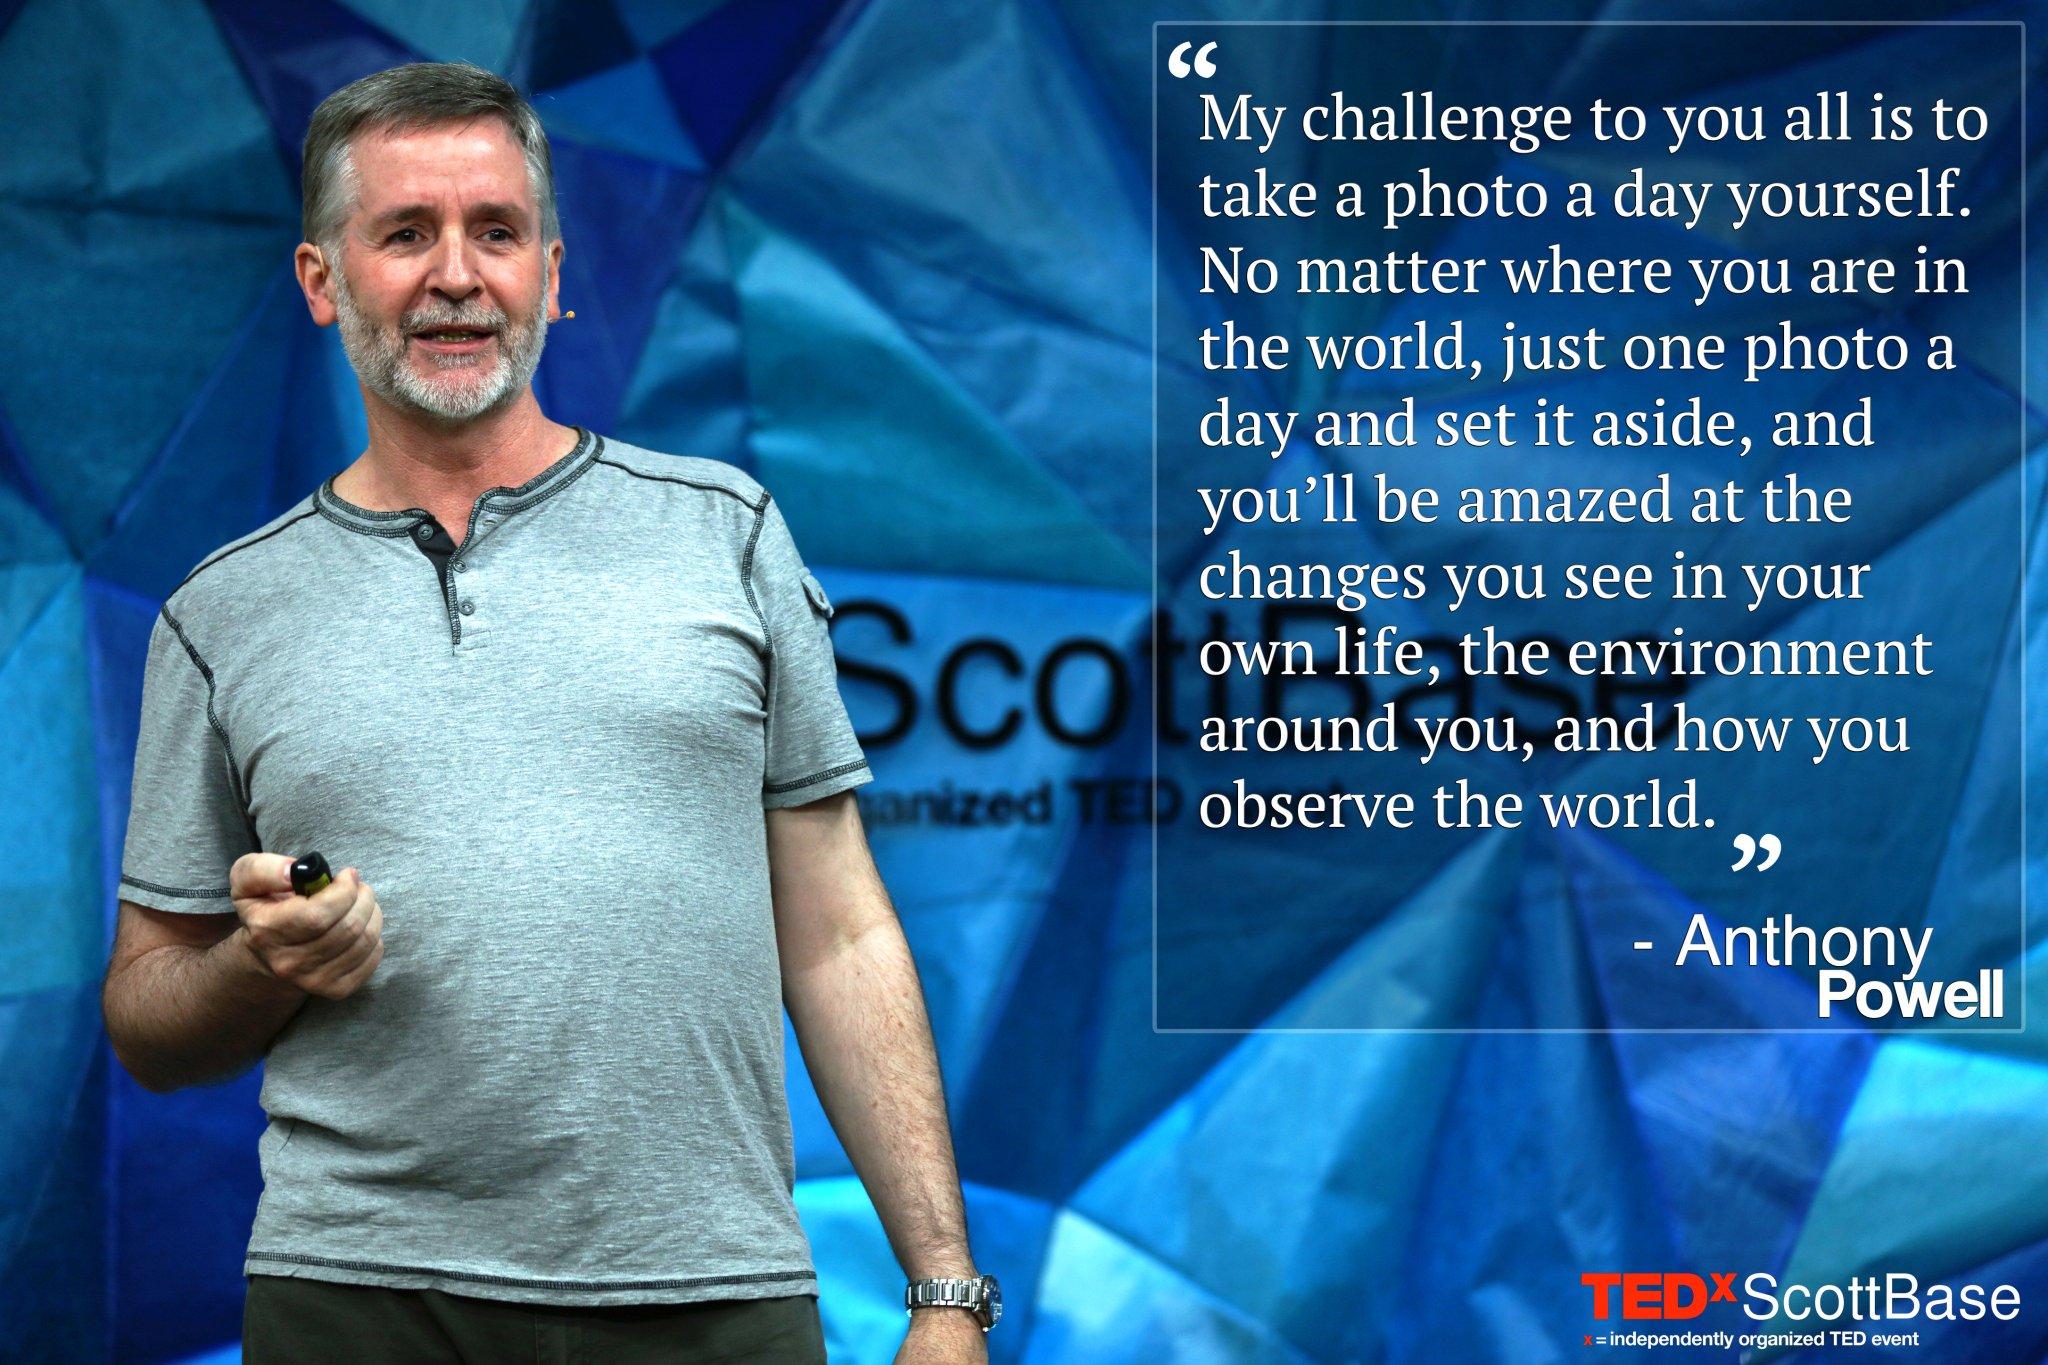 RT: The @Antzkiwi challenge! #TEDxScottBase #photography #Antarctica https://t.co/ICHCLBgGSb via @TEDxScottBase